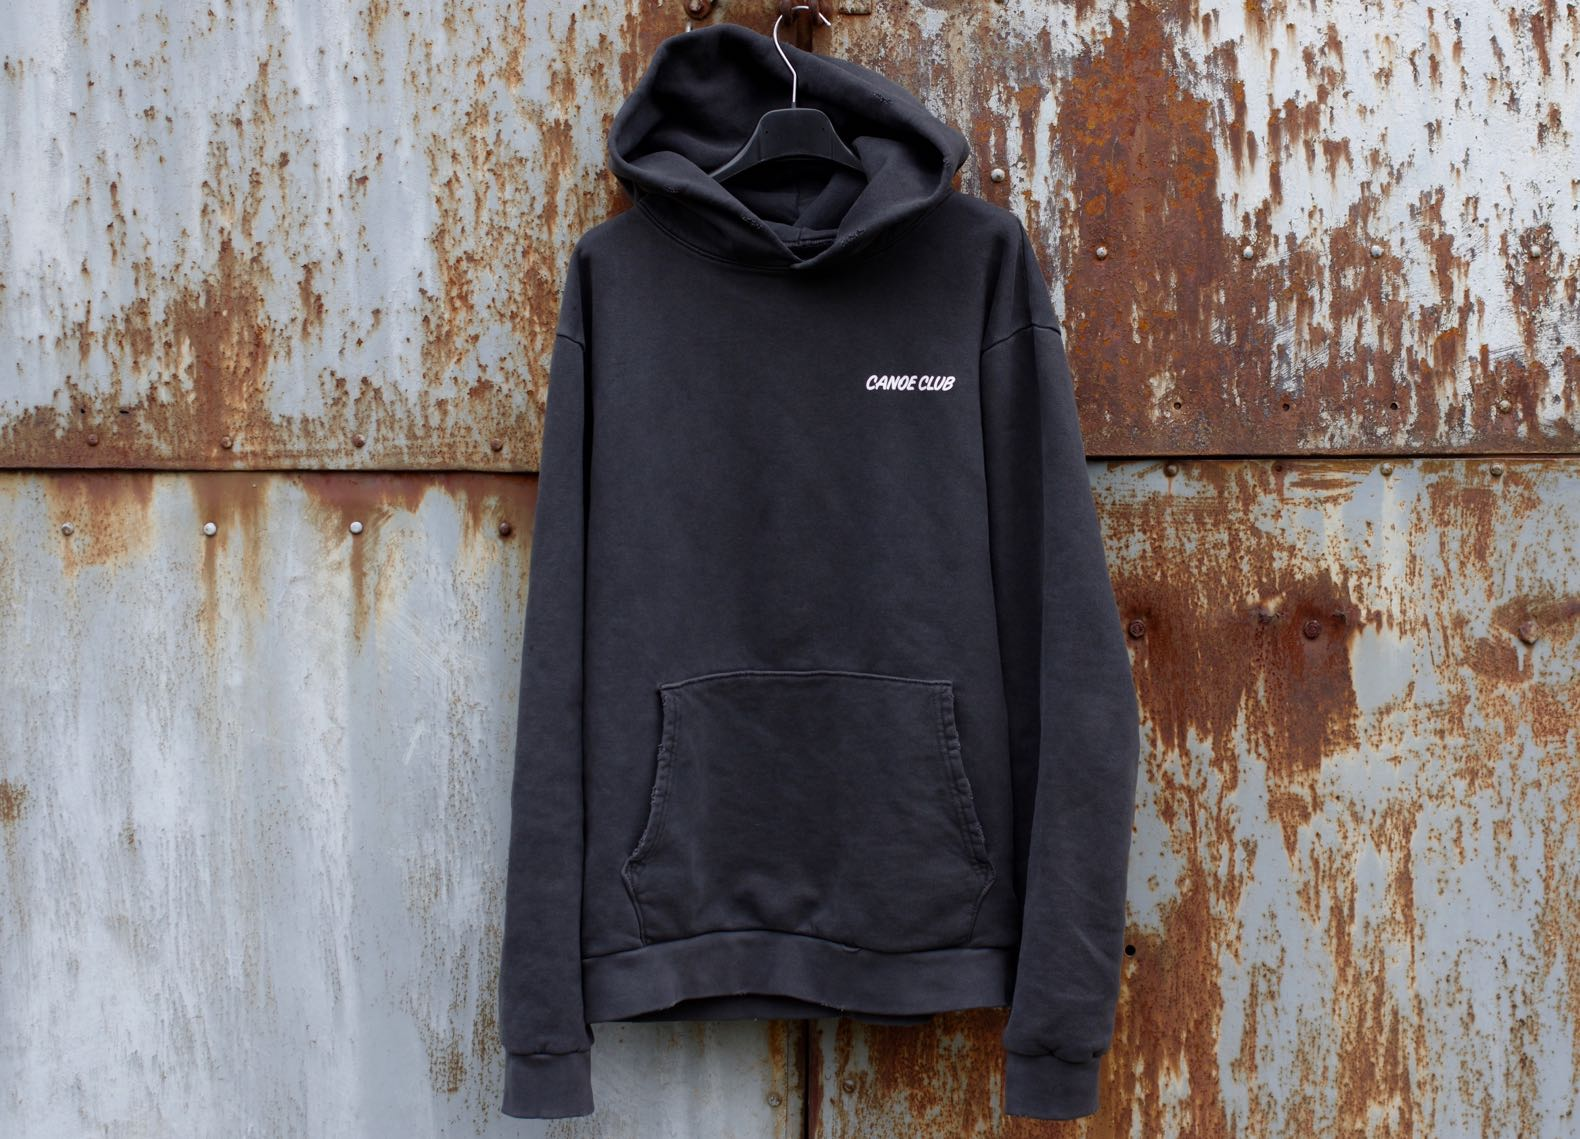 sweat à capuche homme confortable coupe vitnage canoe club hoodie